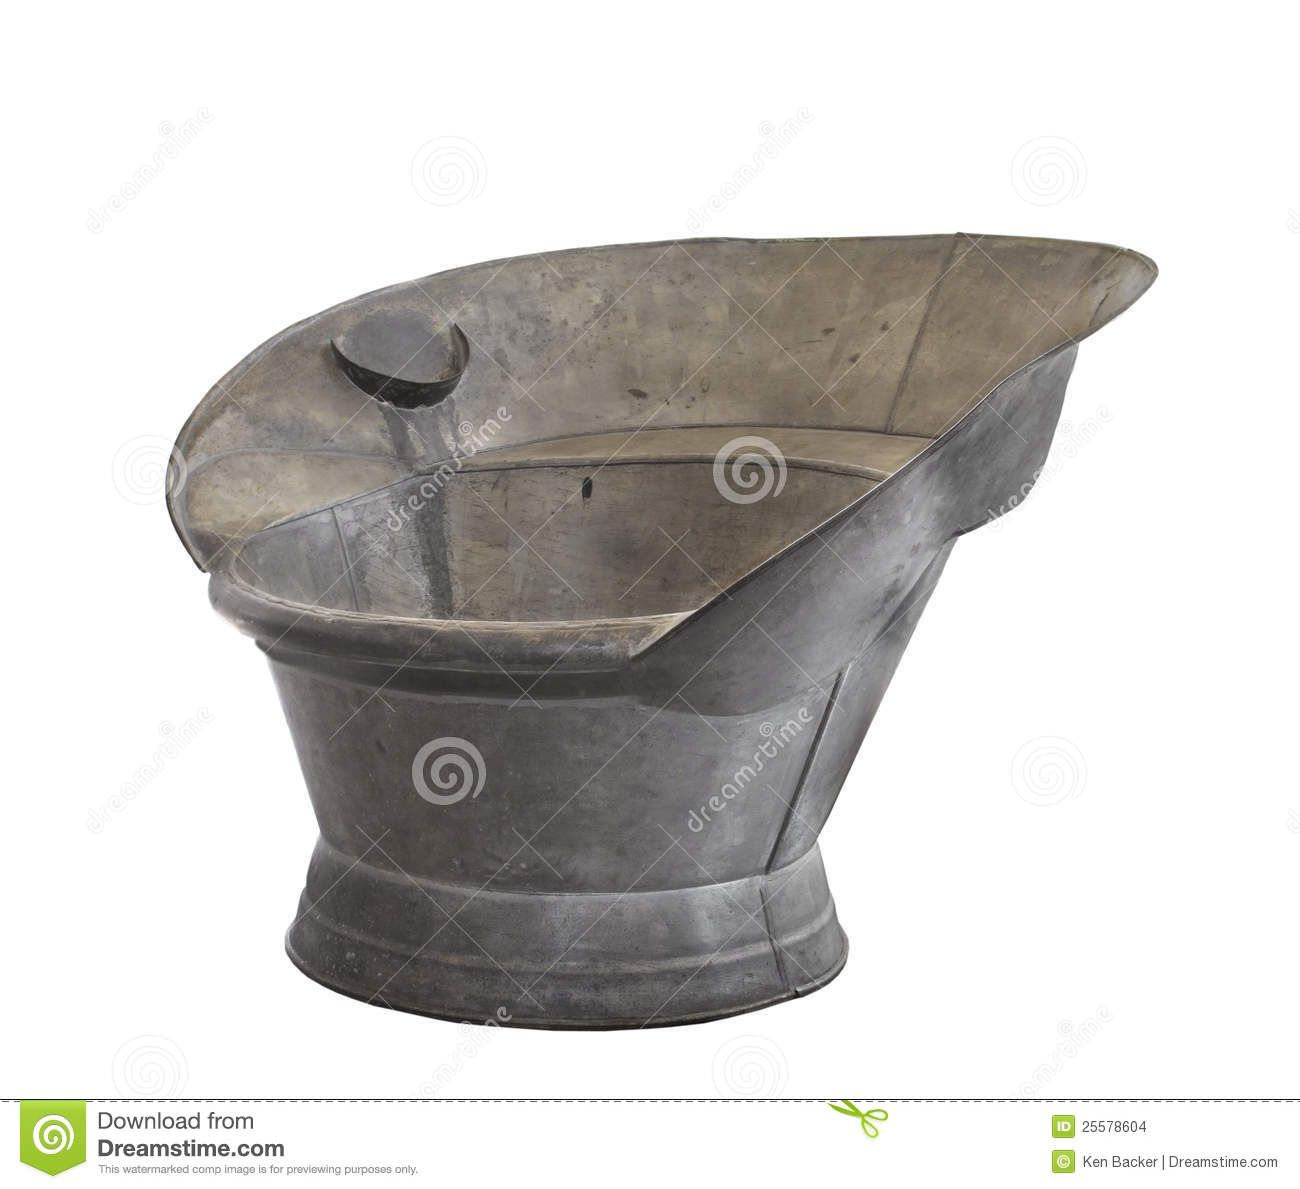 Galvanized Cowboy Bathing Tub | Old Sit In Bathing Tub Made Of Galvanized  Tin,